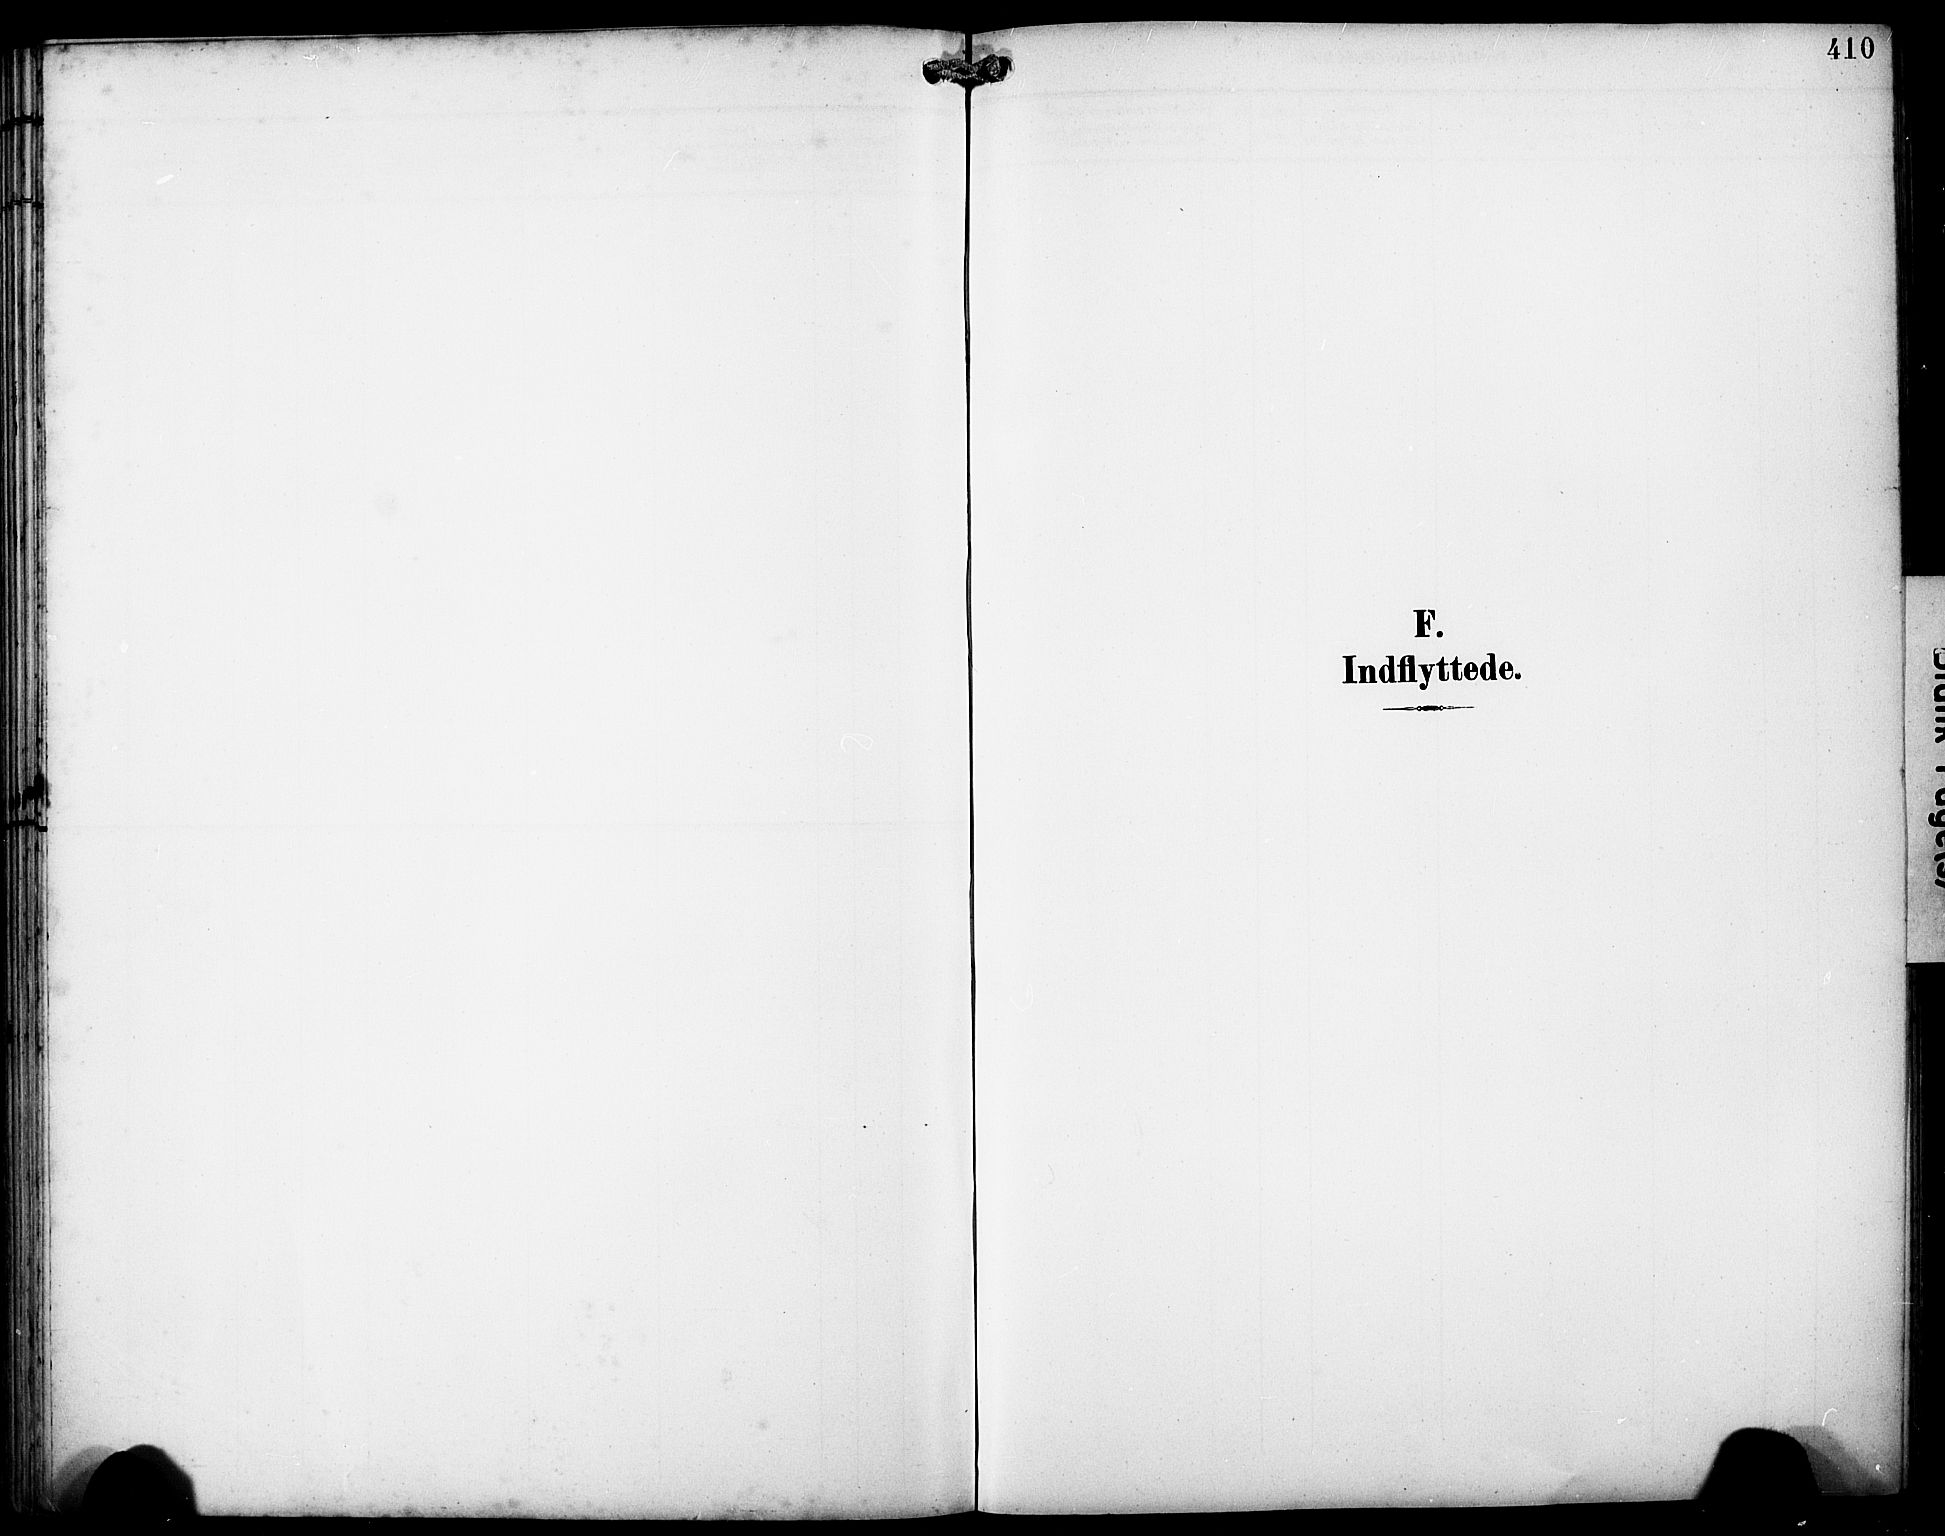 SAB, Fjell sokneprestembete, H/Hab: Klokkerbok nr. A 5, 1899-1918, s. 410